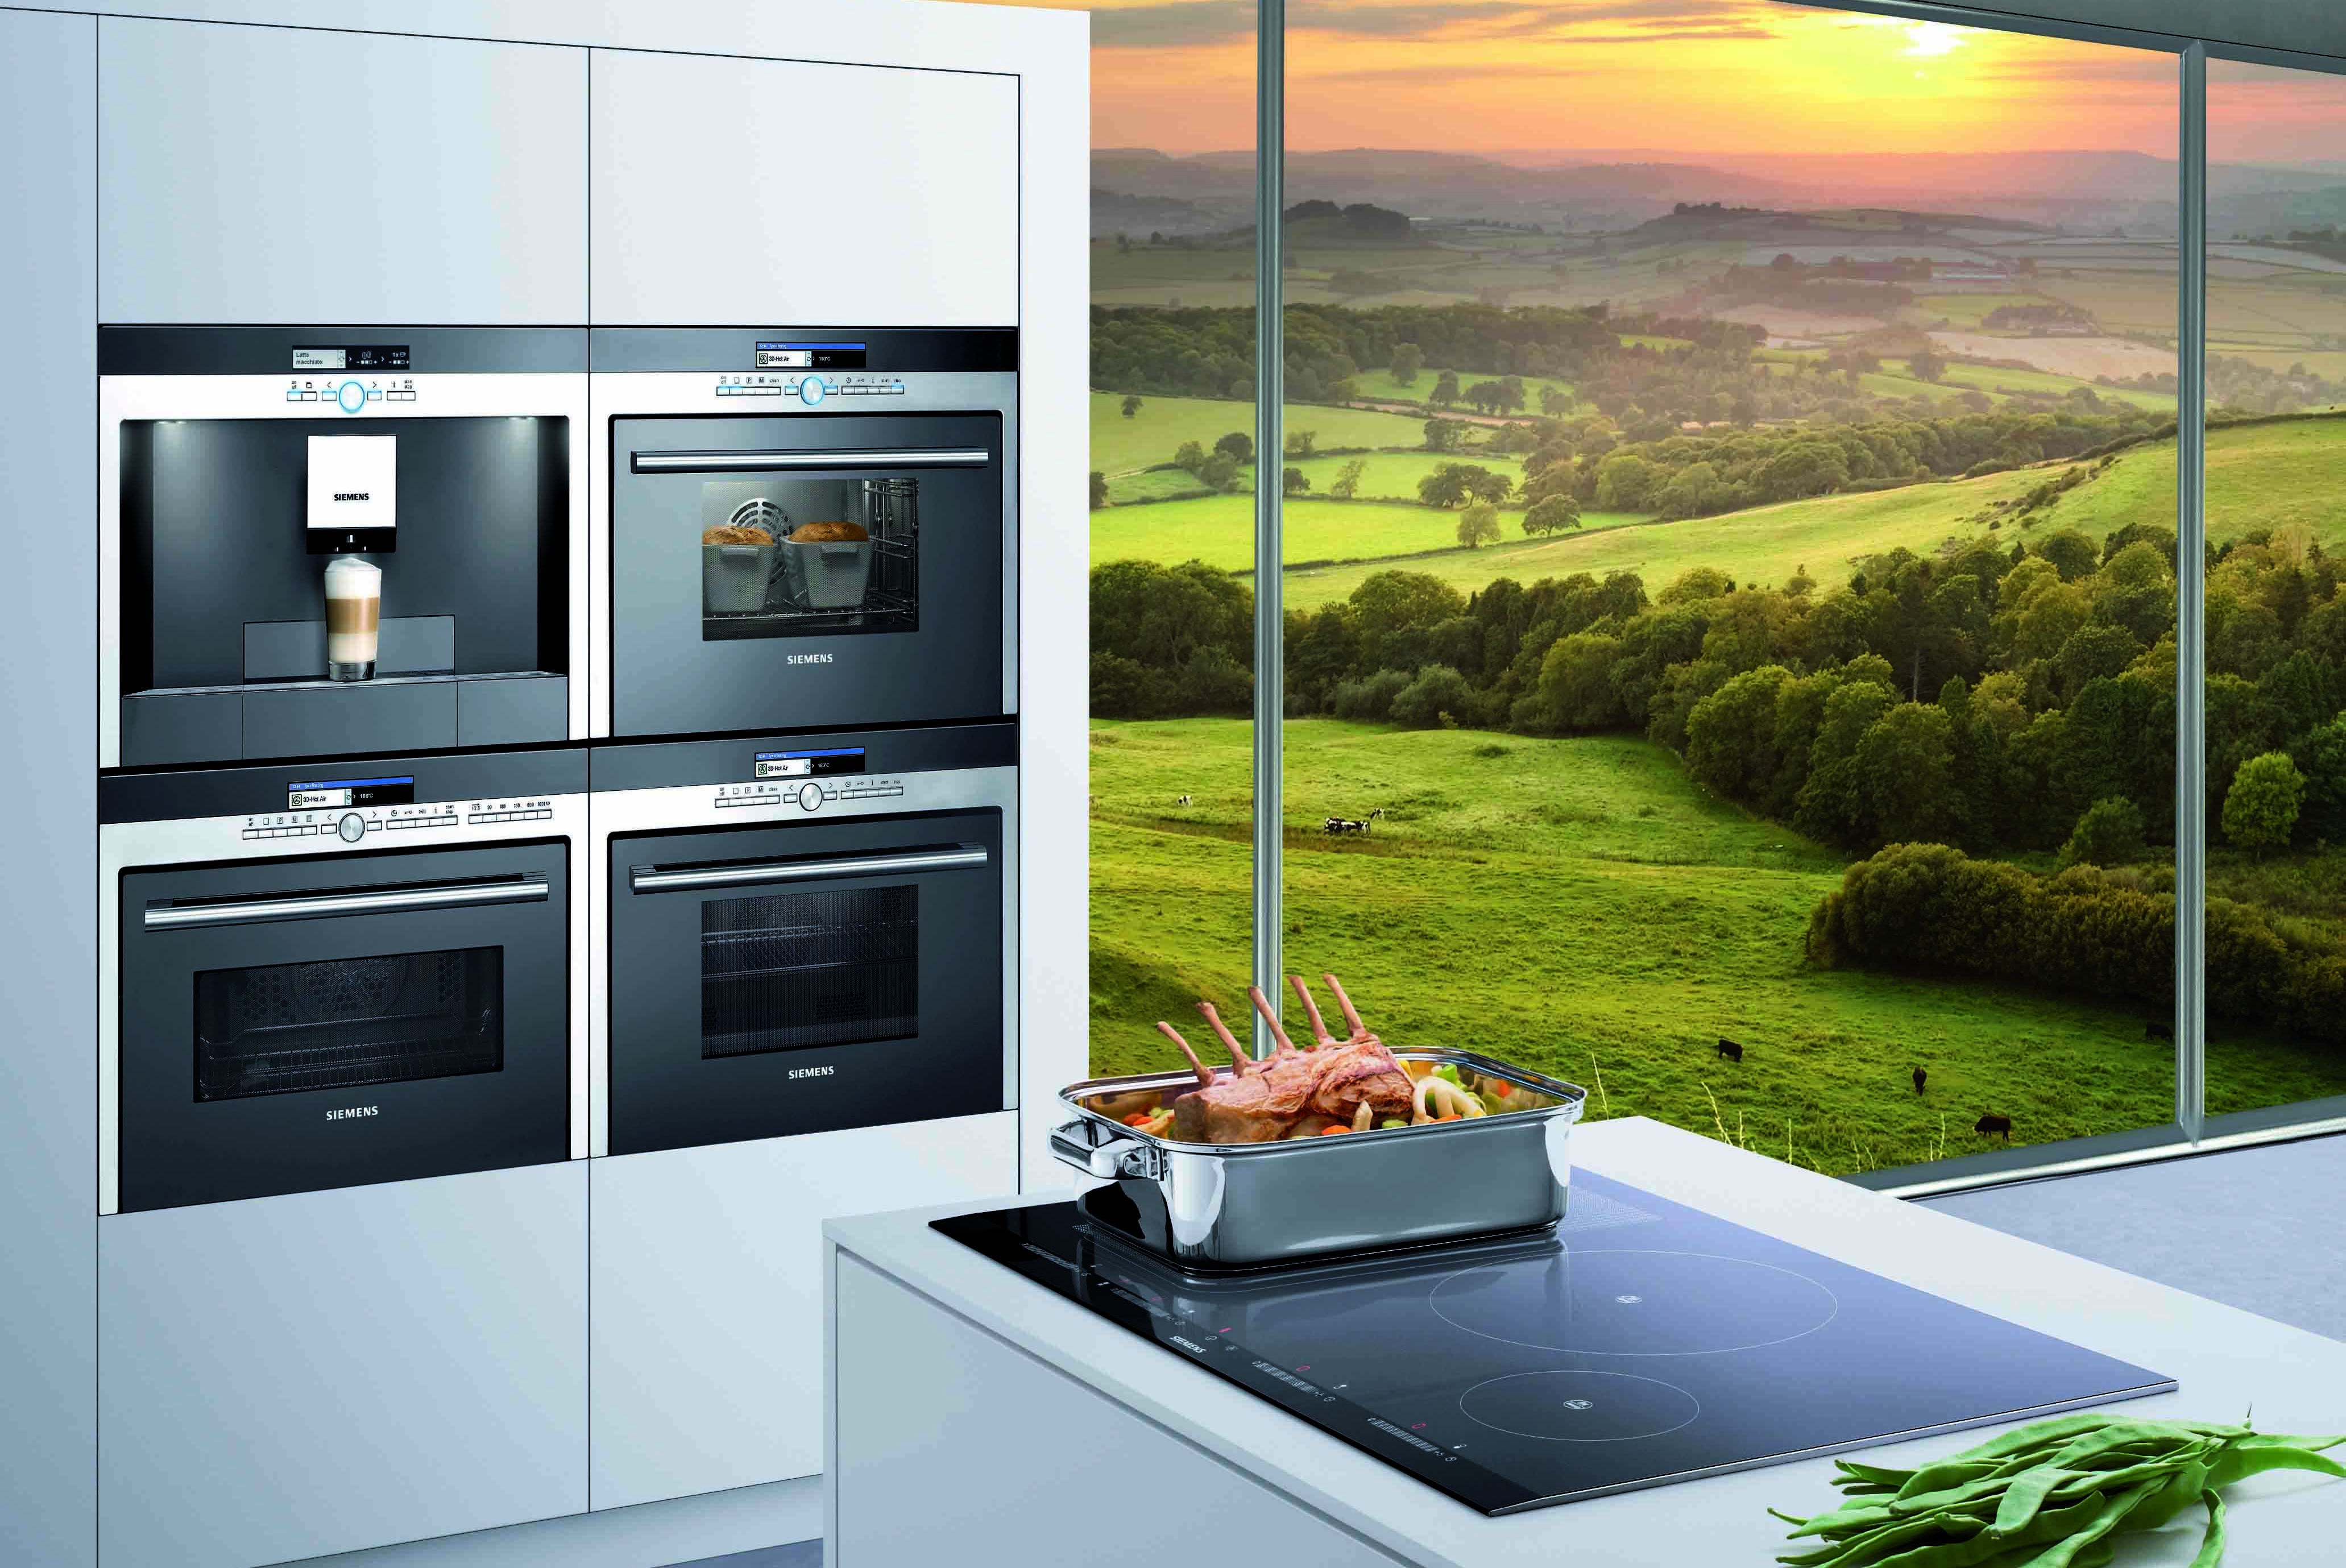 New Kitchen Big Savings New Kitchen Kitchen Appliances